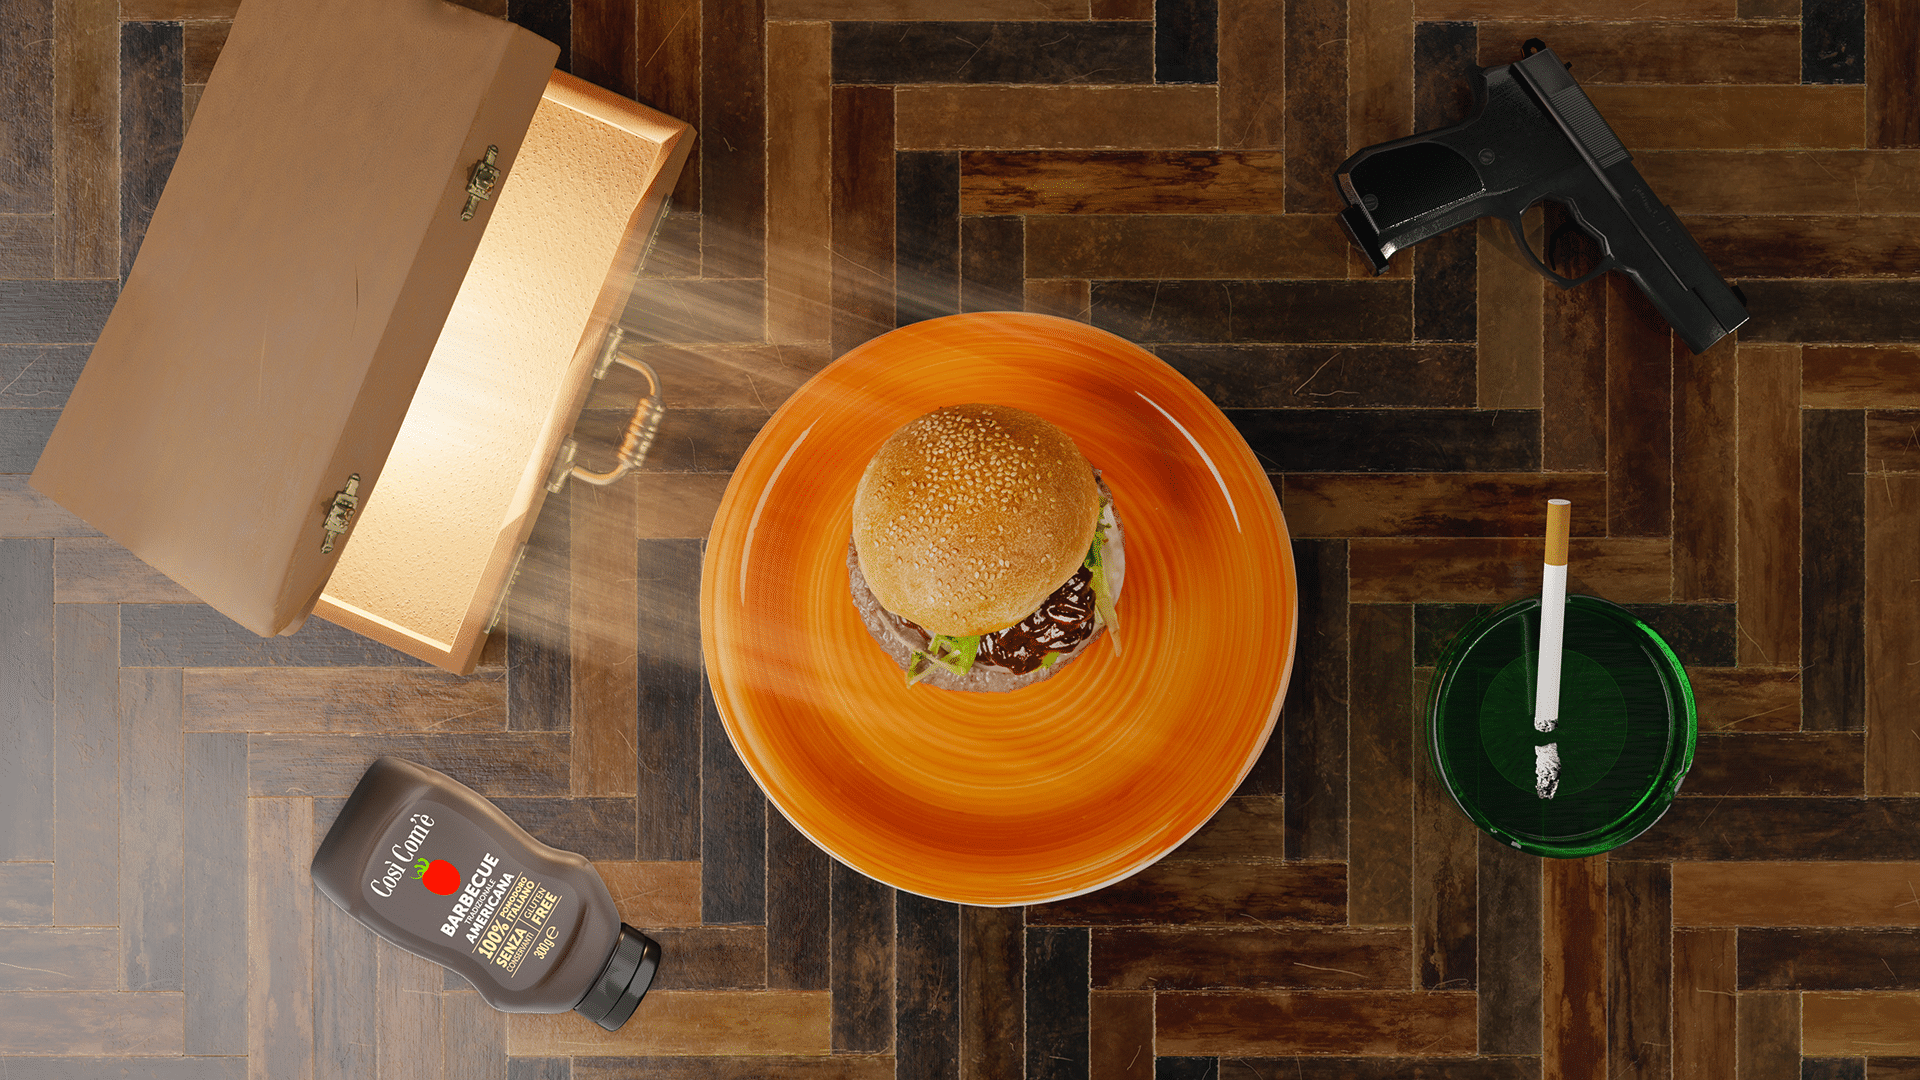 Pulp Fiction: Big Kahuna Burger con salsa barbecue